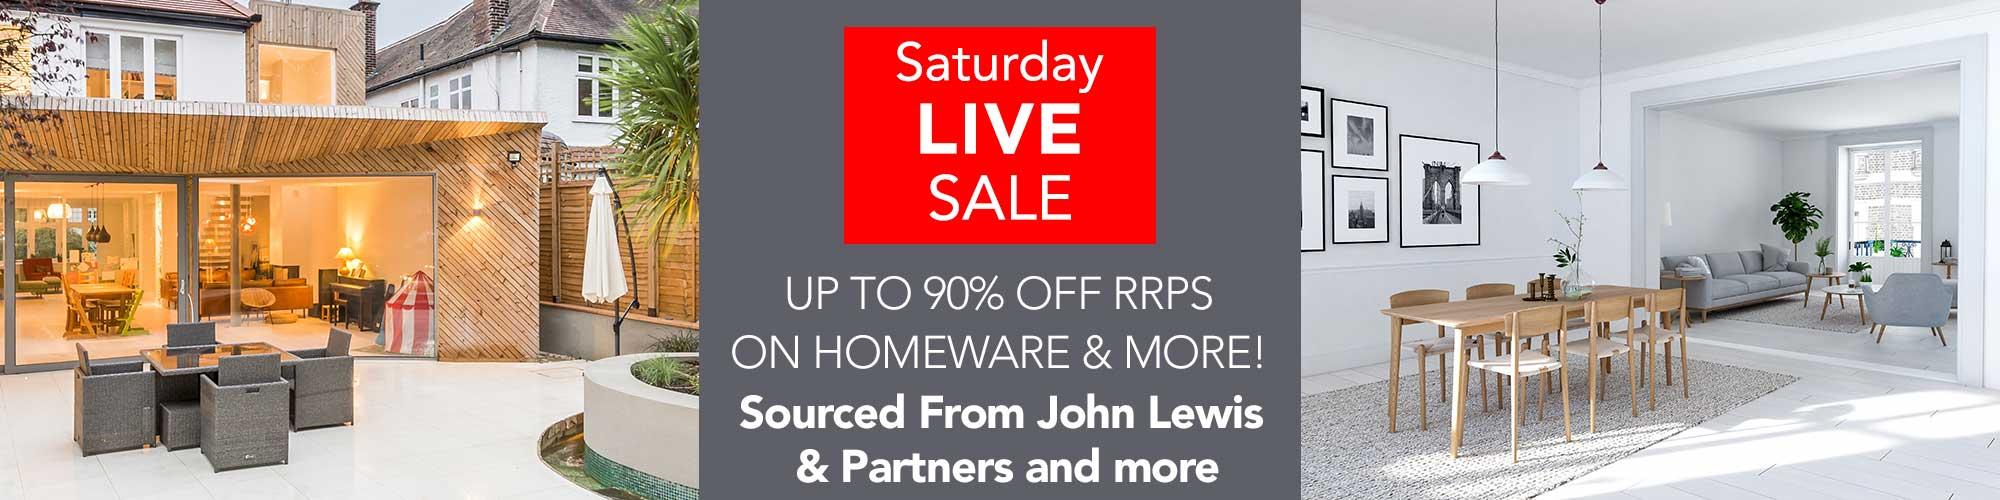 Saturday's Live Auction - Starts 10am Prompt